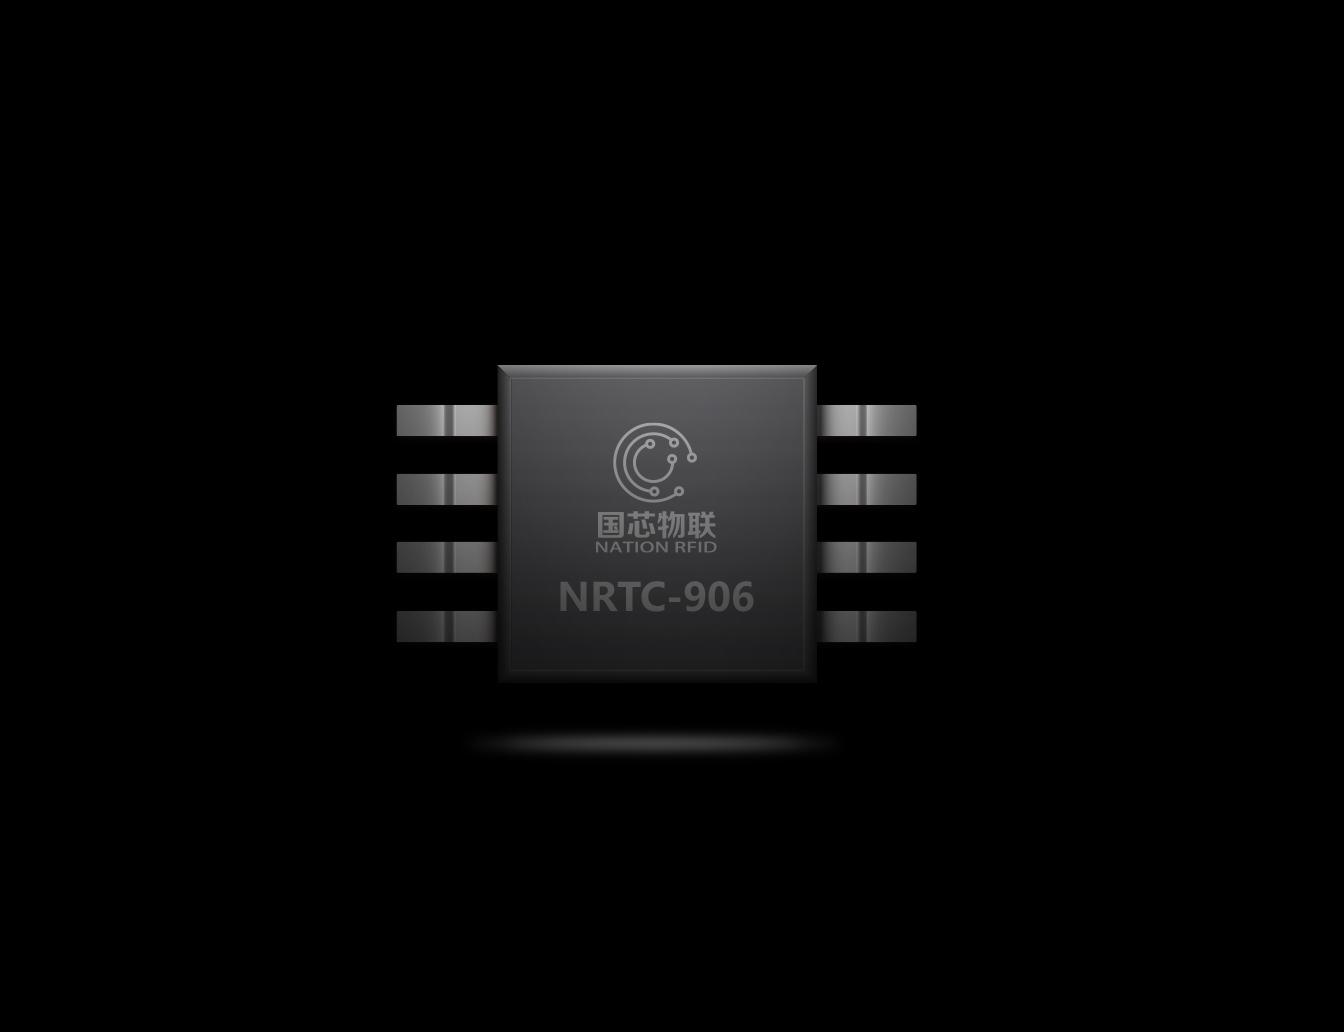 NRTC-906标签芯片.jpg